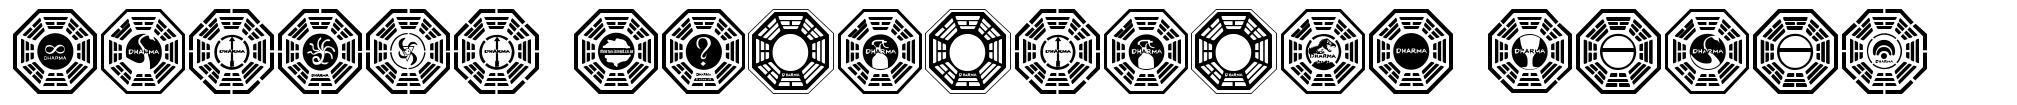 Dharma Initiative Logos font